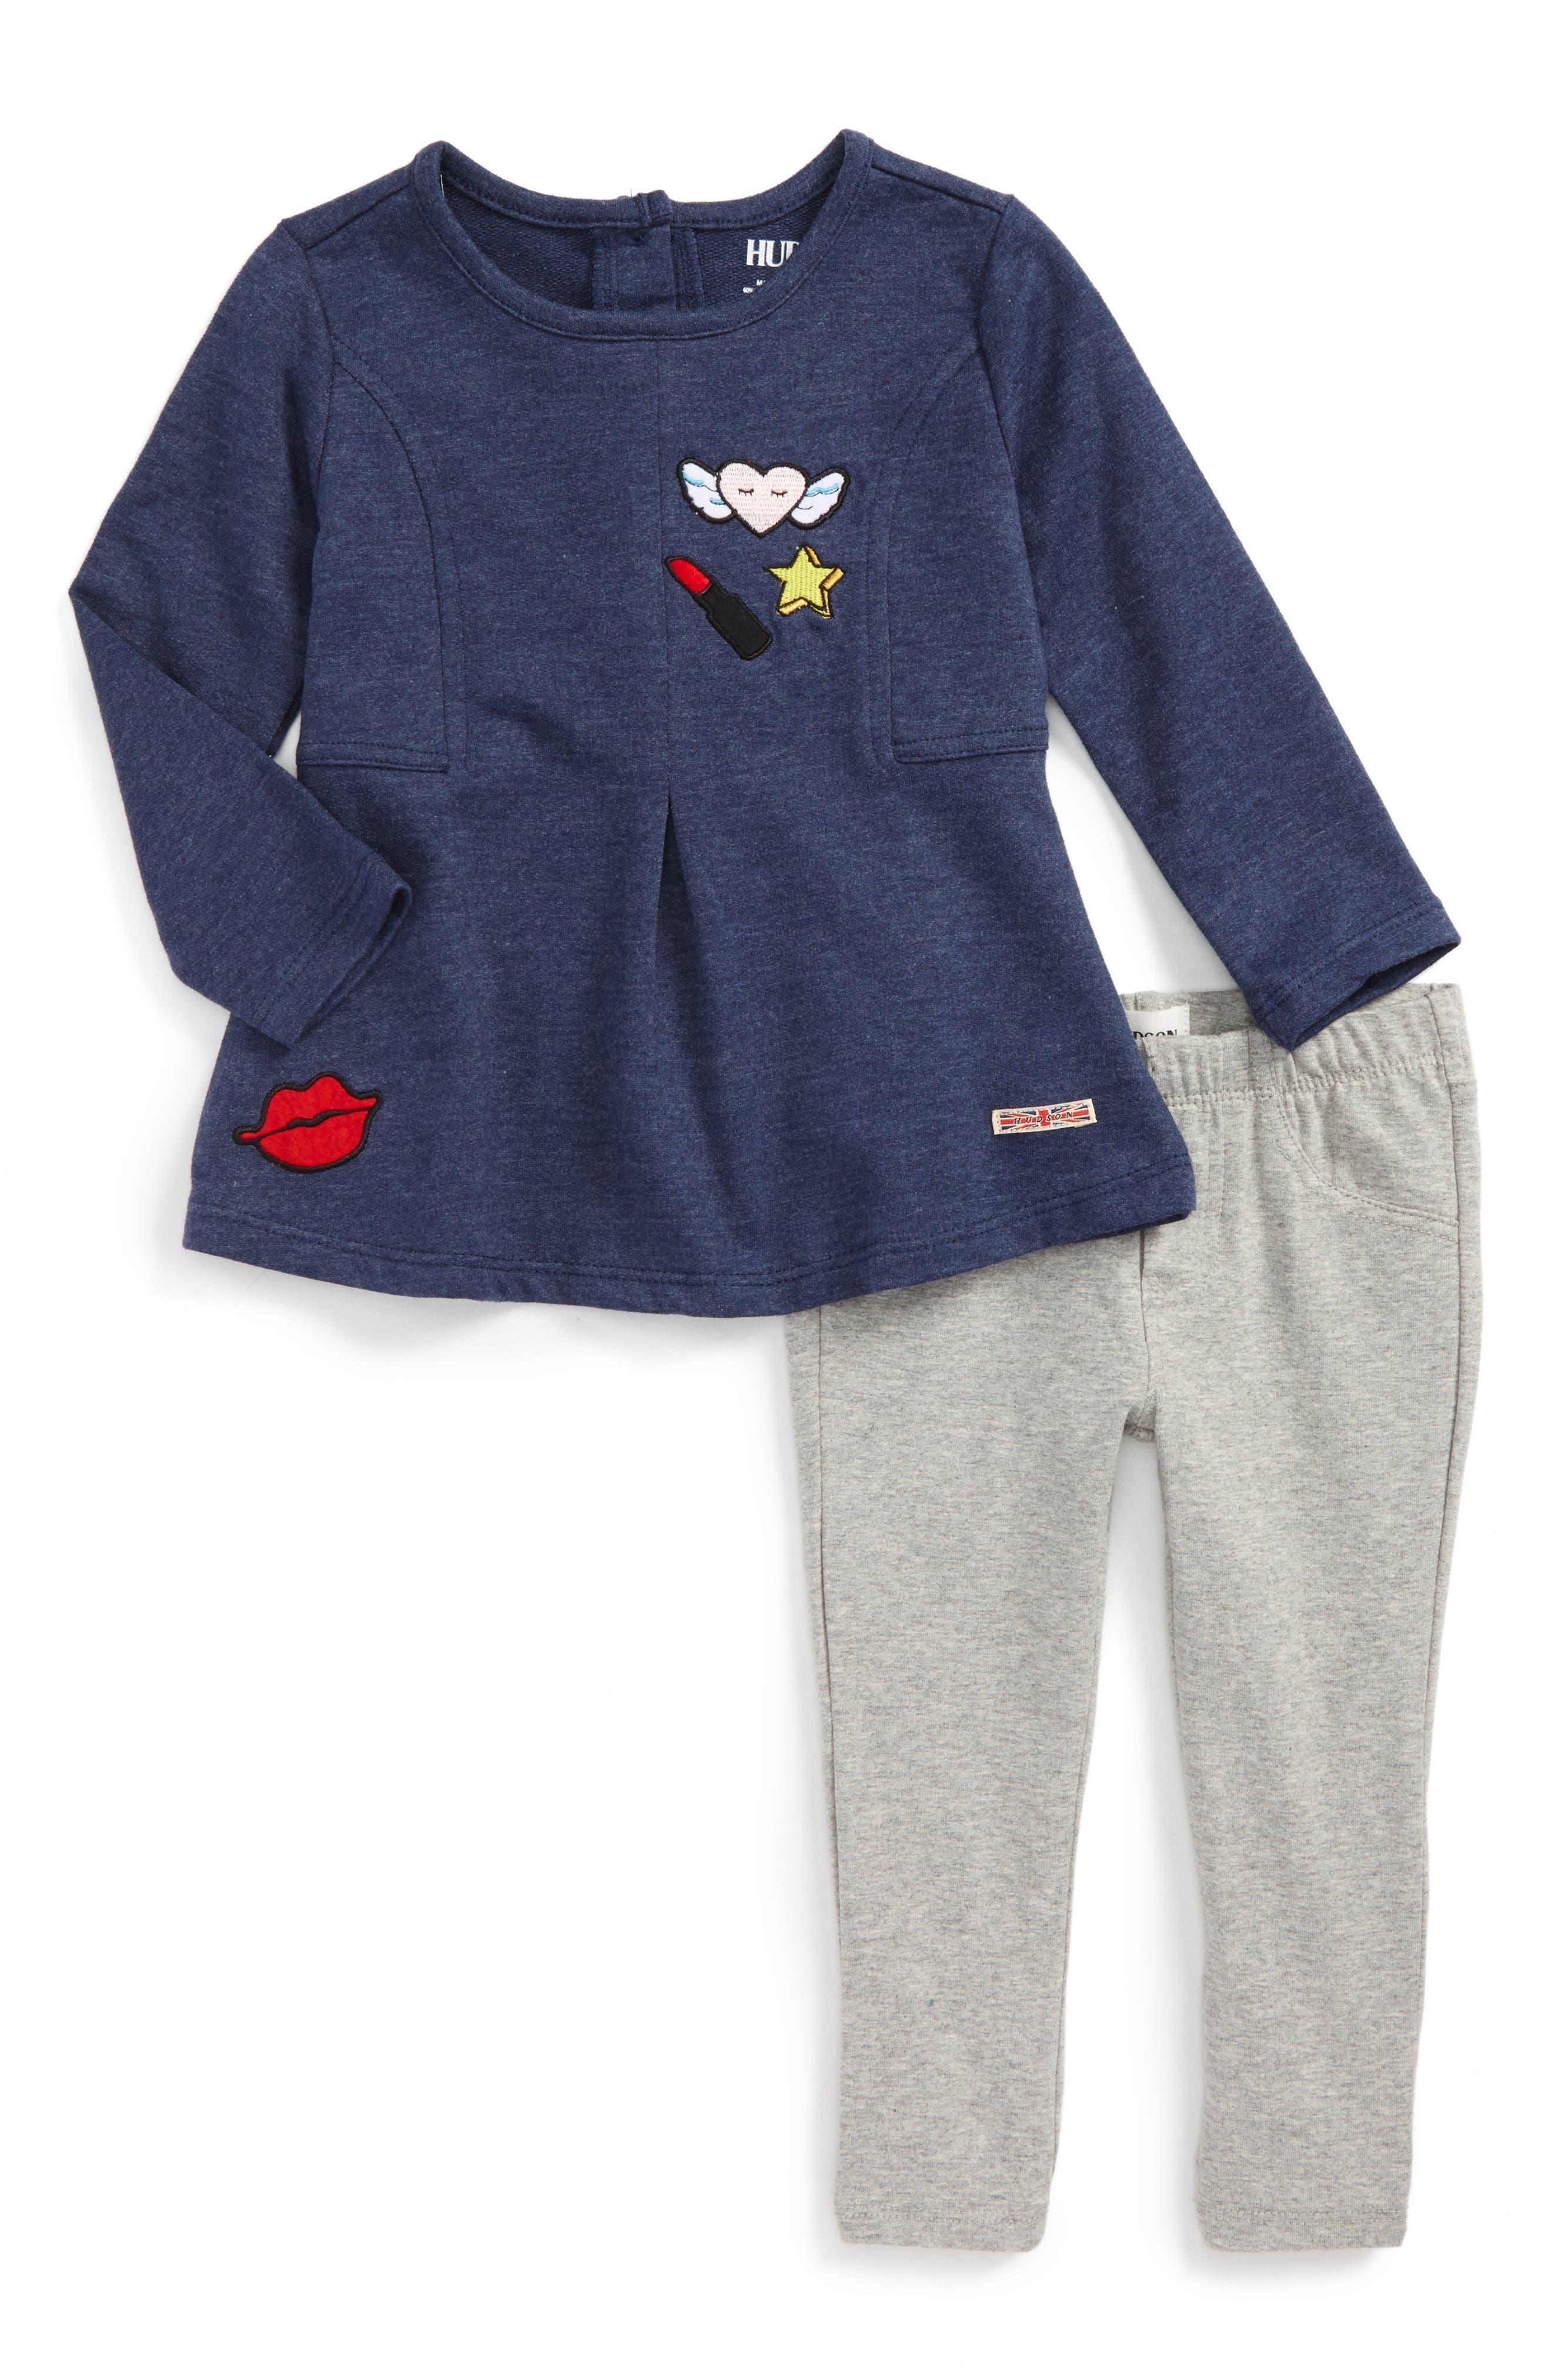 Hudson Appliqué Swing Top & Leggings Set (Toddler Girls)